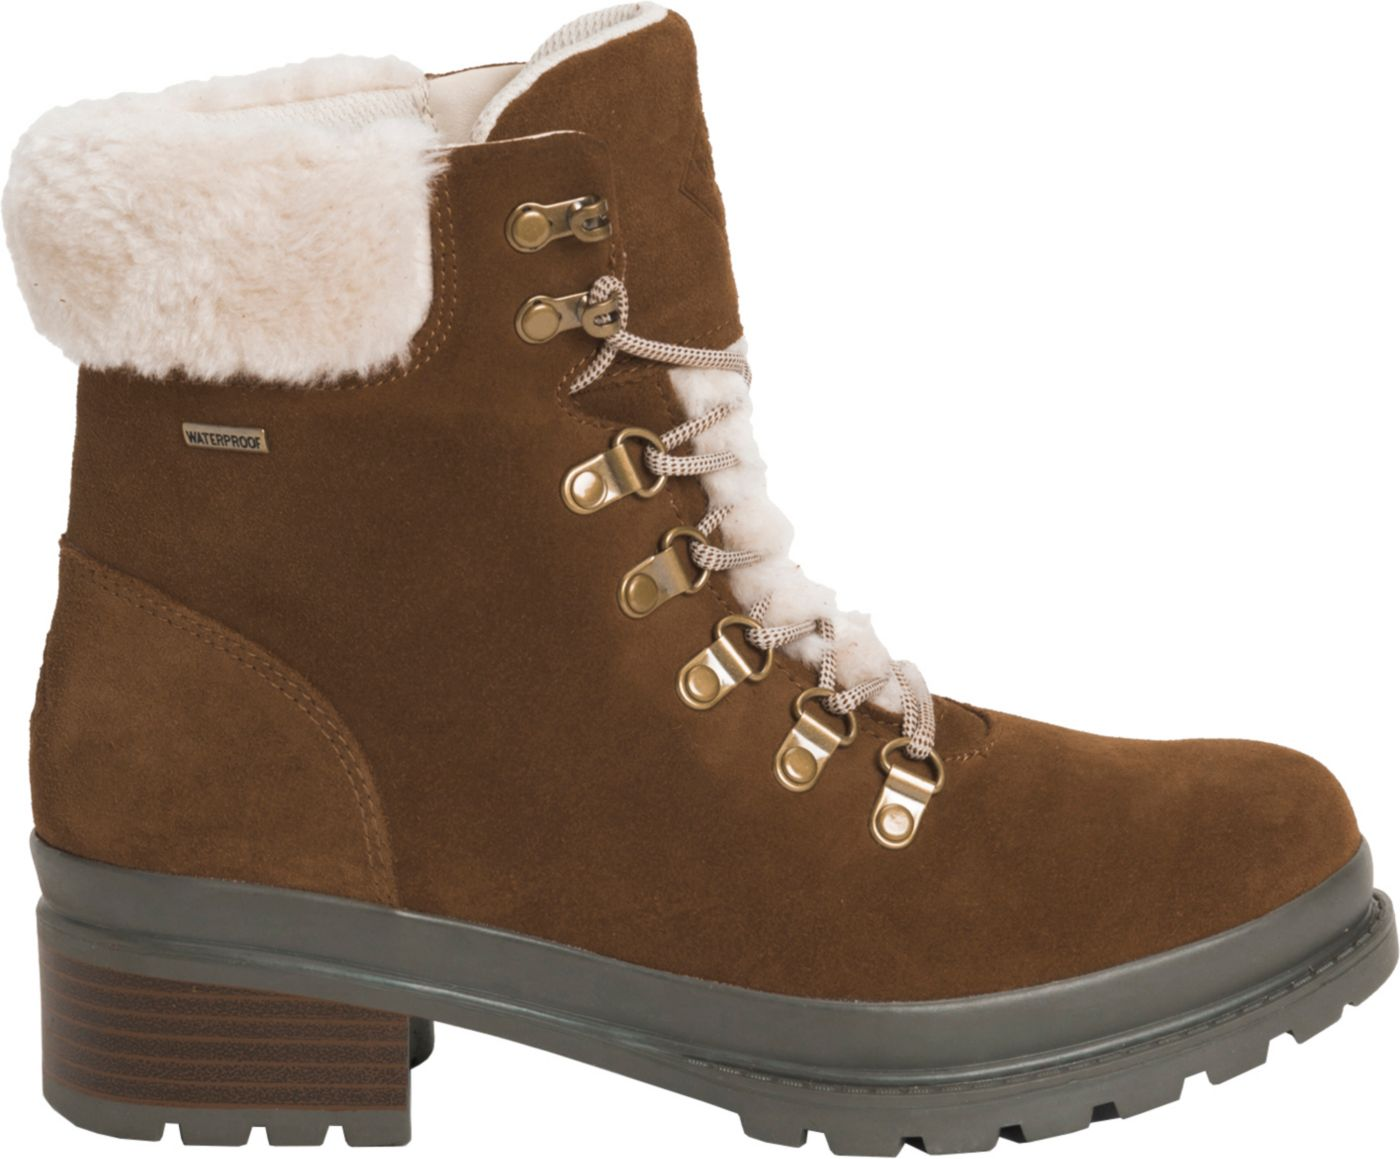 Muck Boots Women's Liberty Alpine Supreme Waterproof Casual Boots